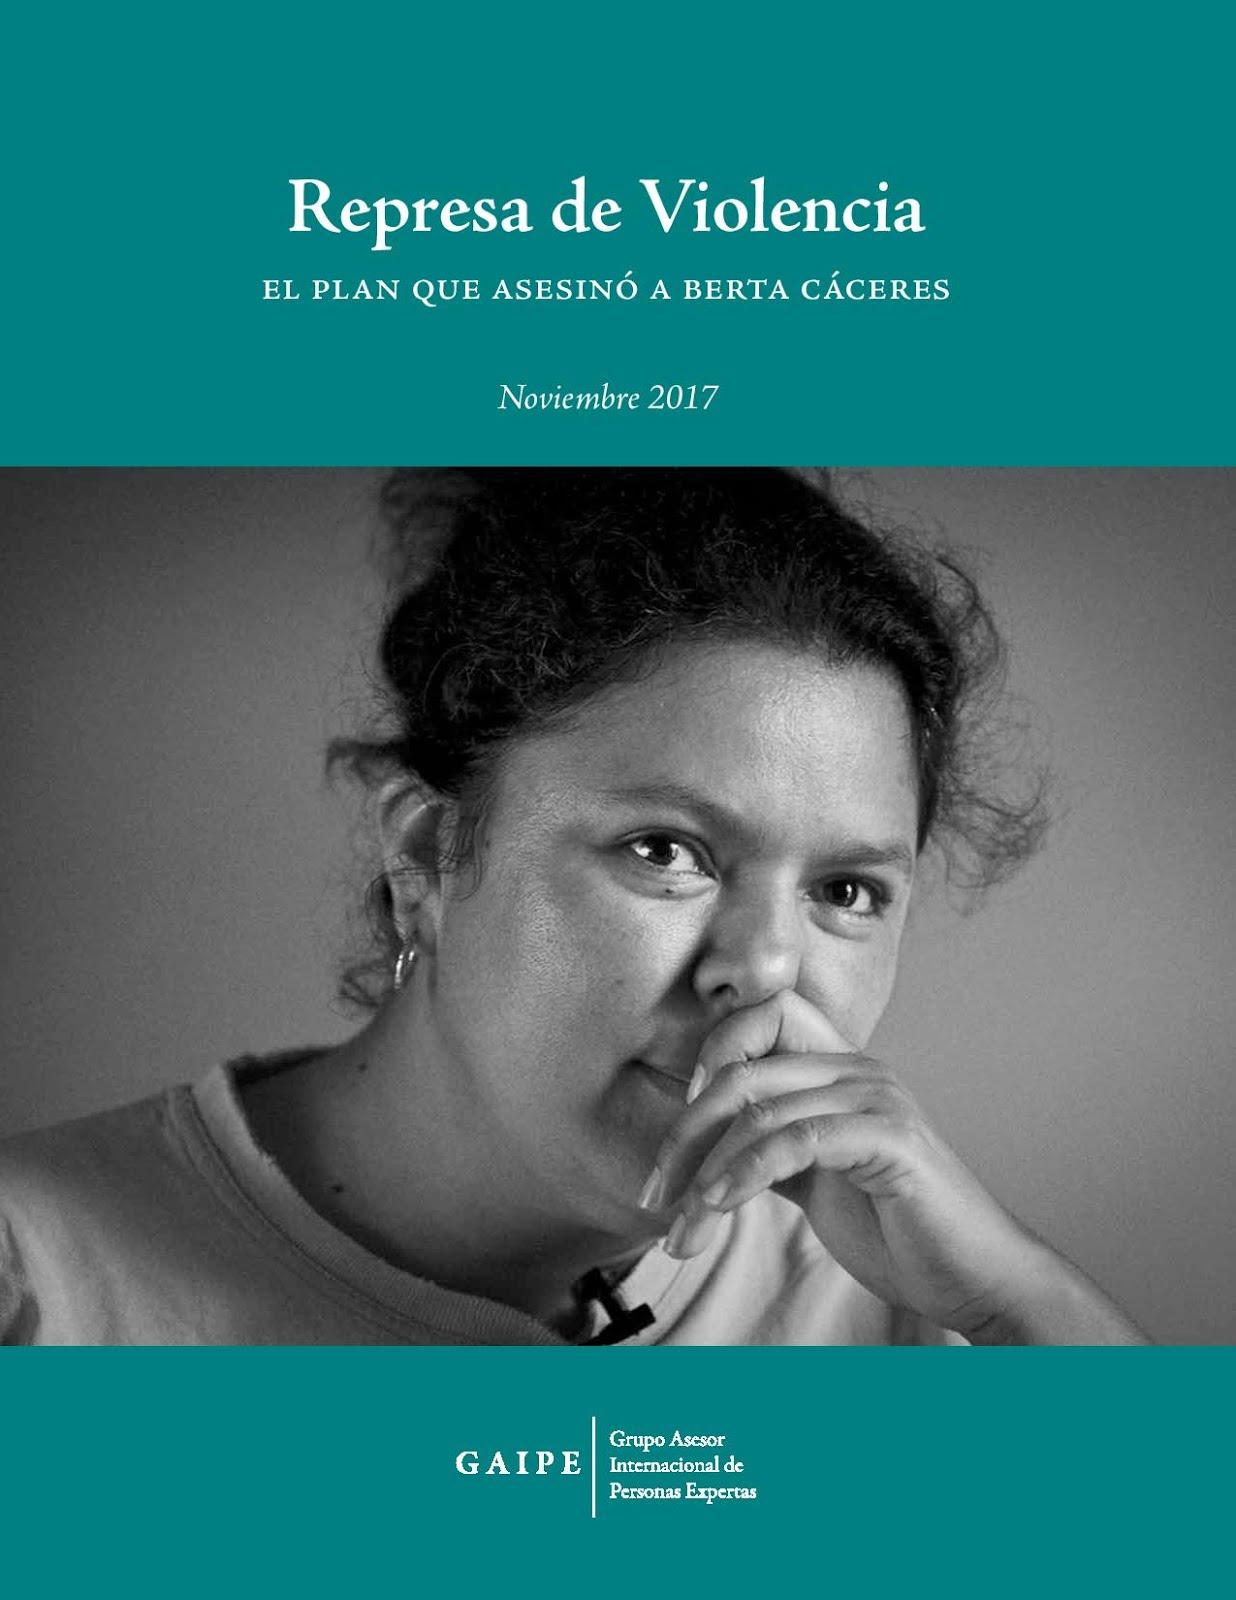 Represa de Violencia - Der Plan, der Berta Cáceres ermordete